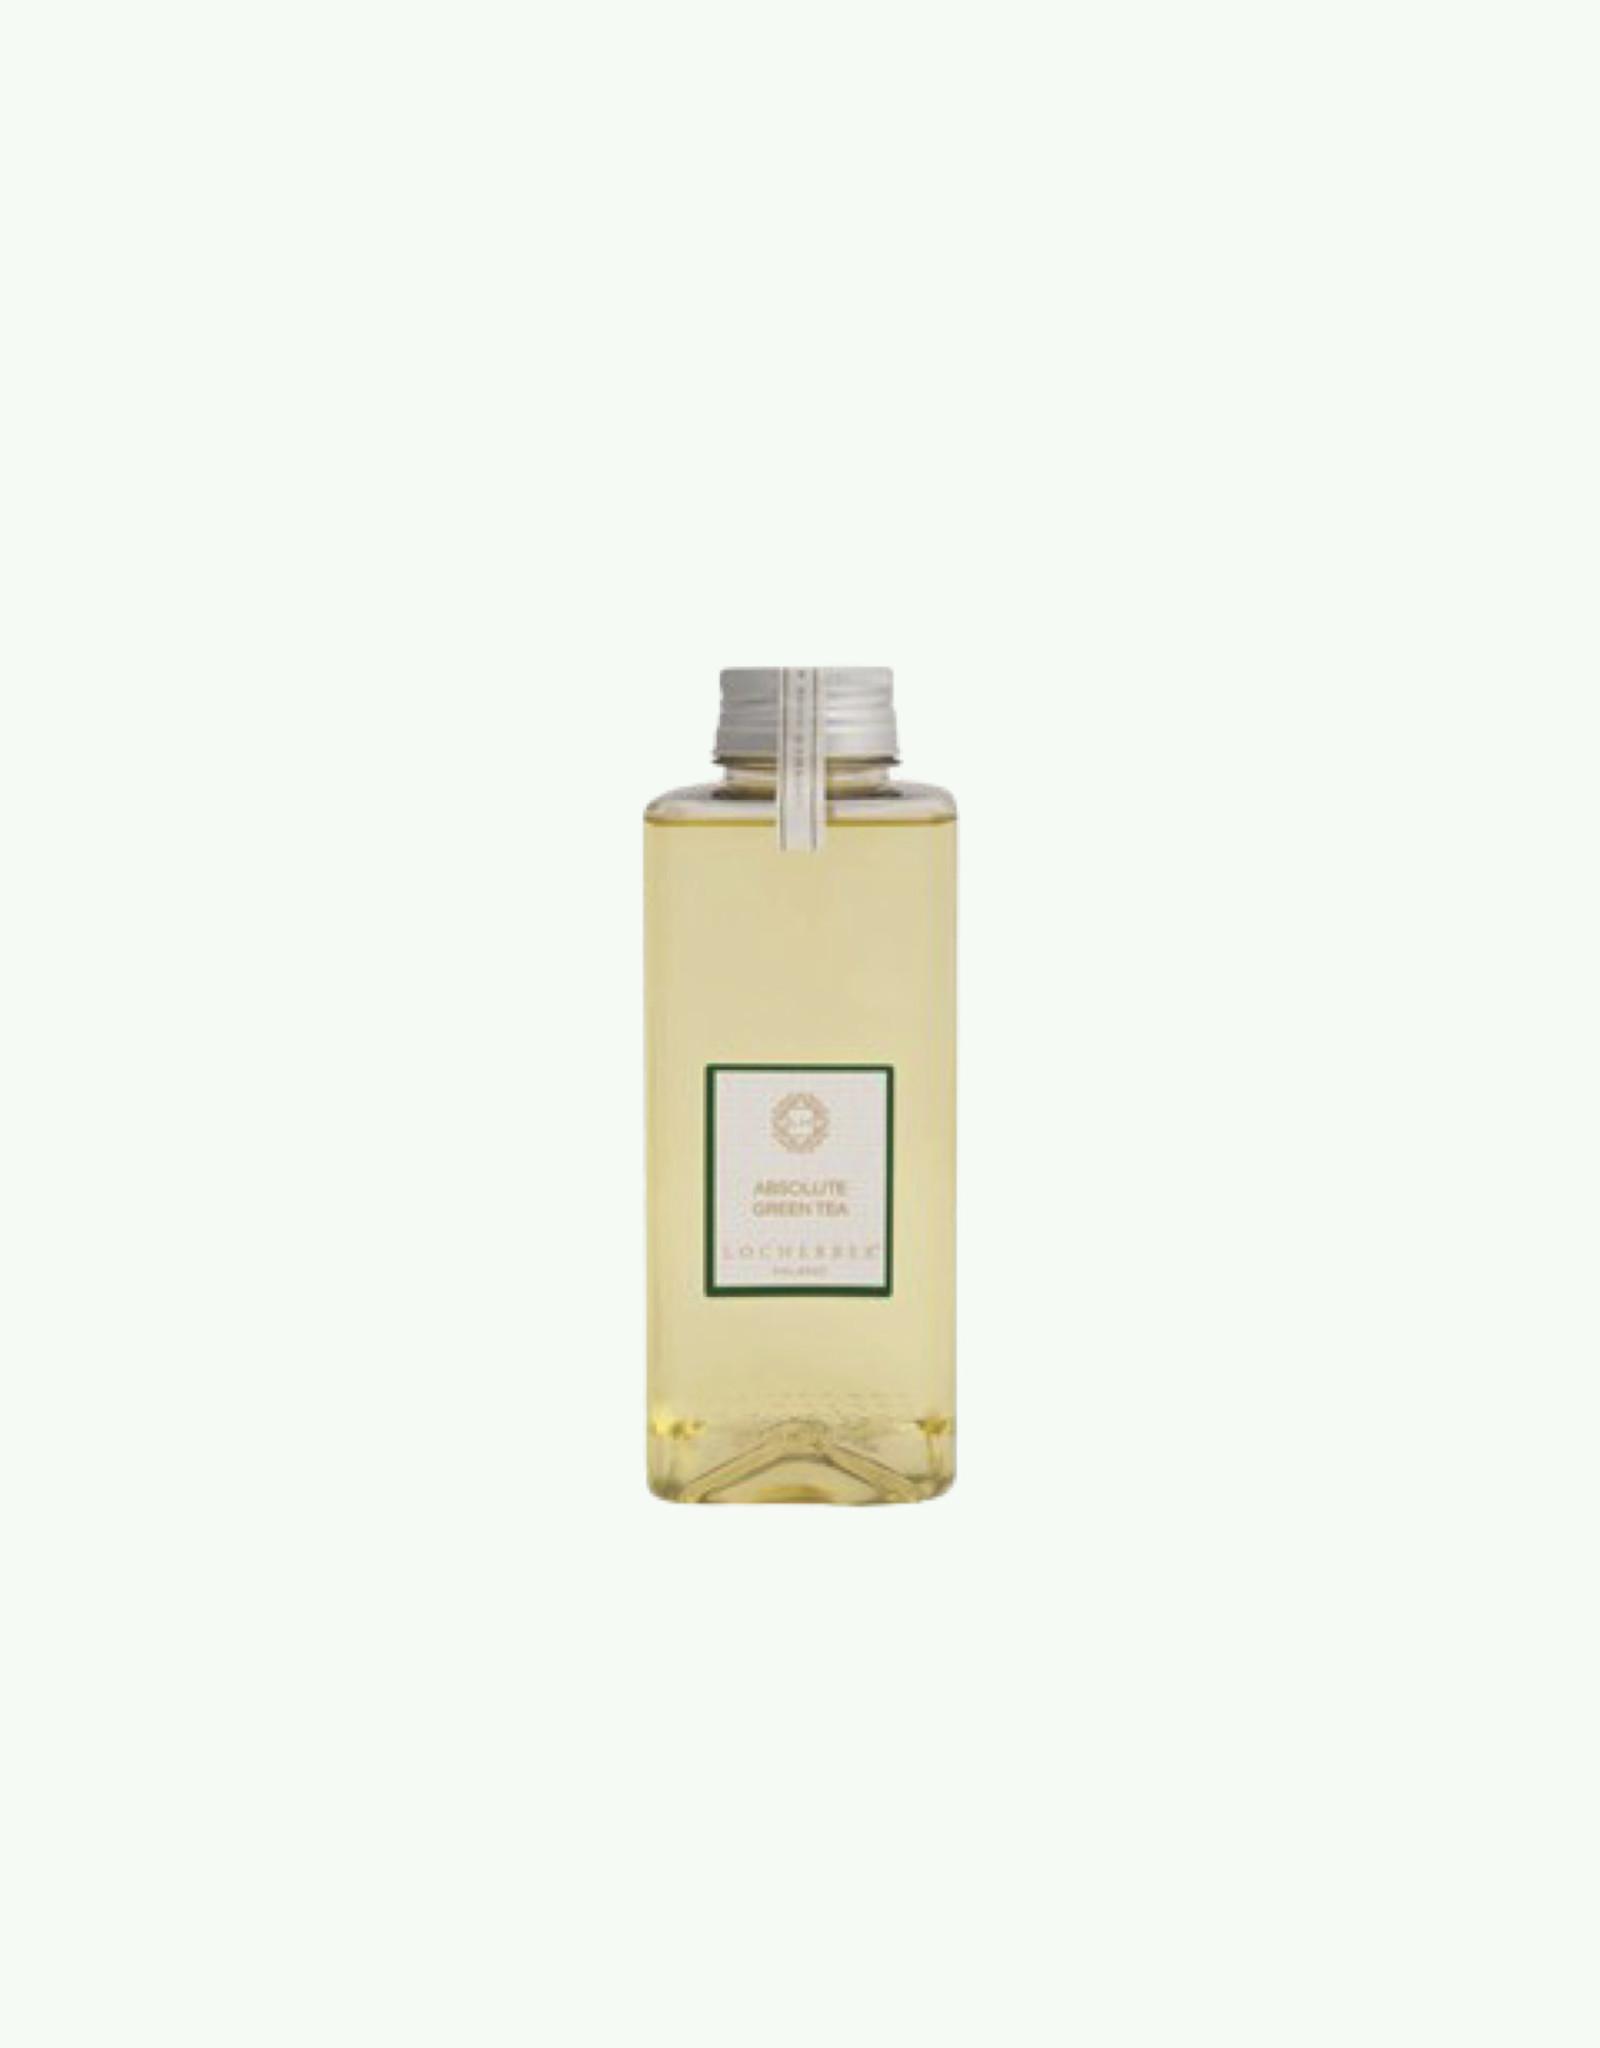 Locherber Locherber - Absolute Green Tea - Bouteille de recharge 250 ml